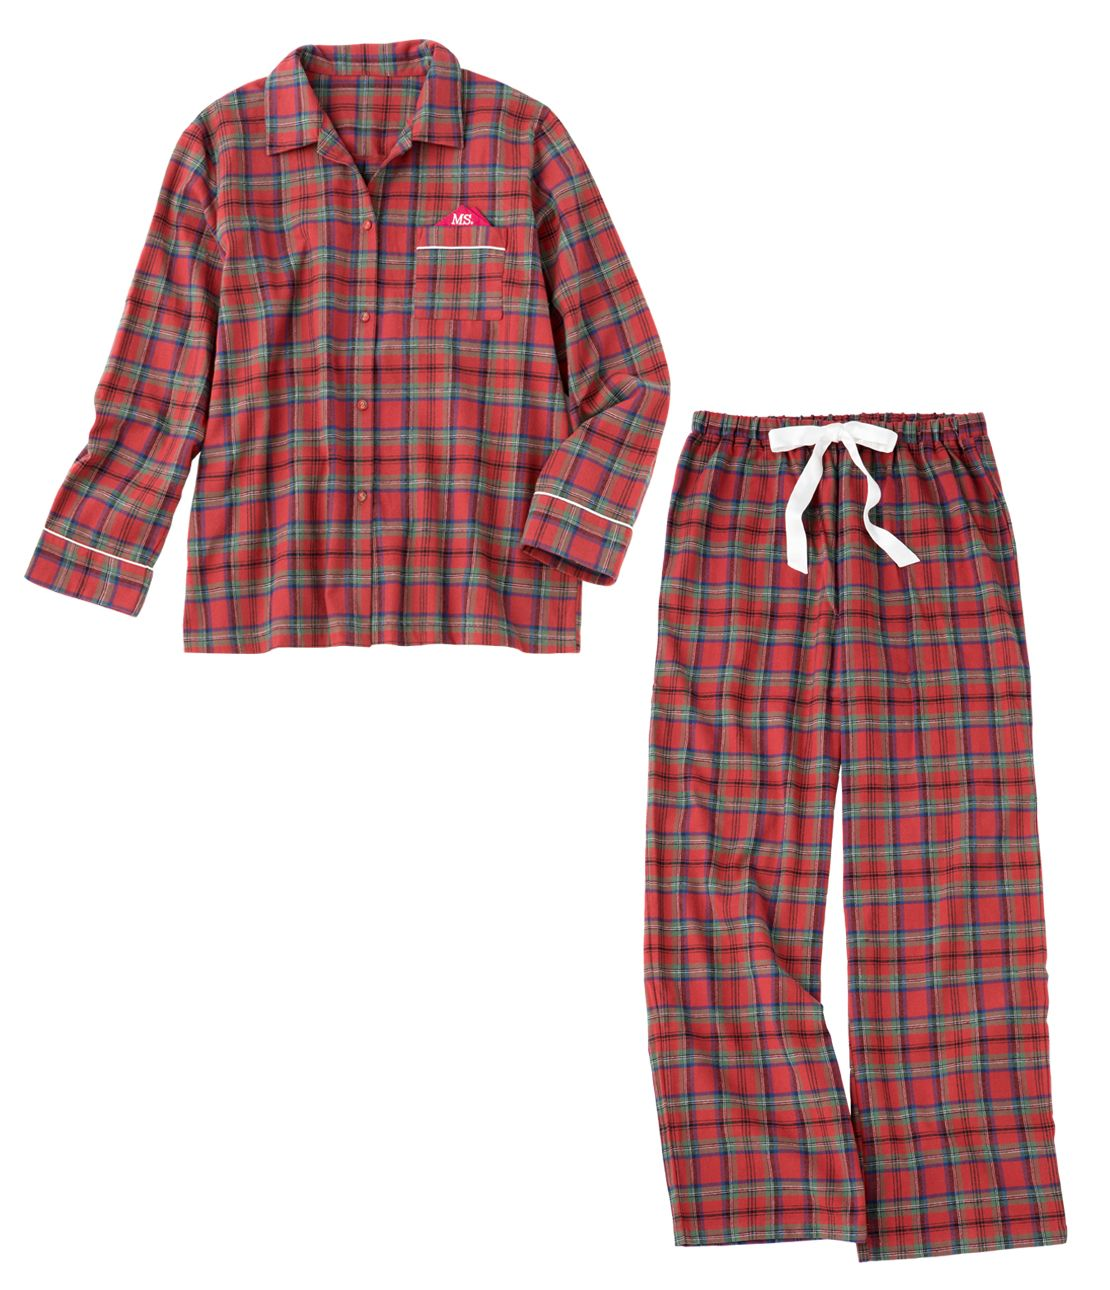 Both sides brushed flannel shirt pajamas